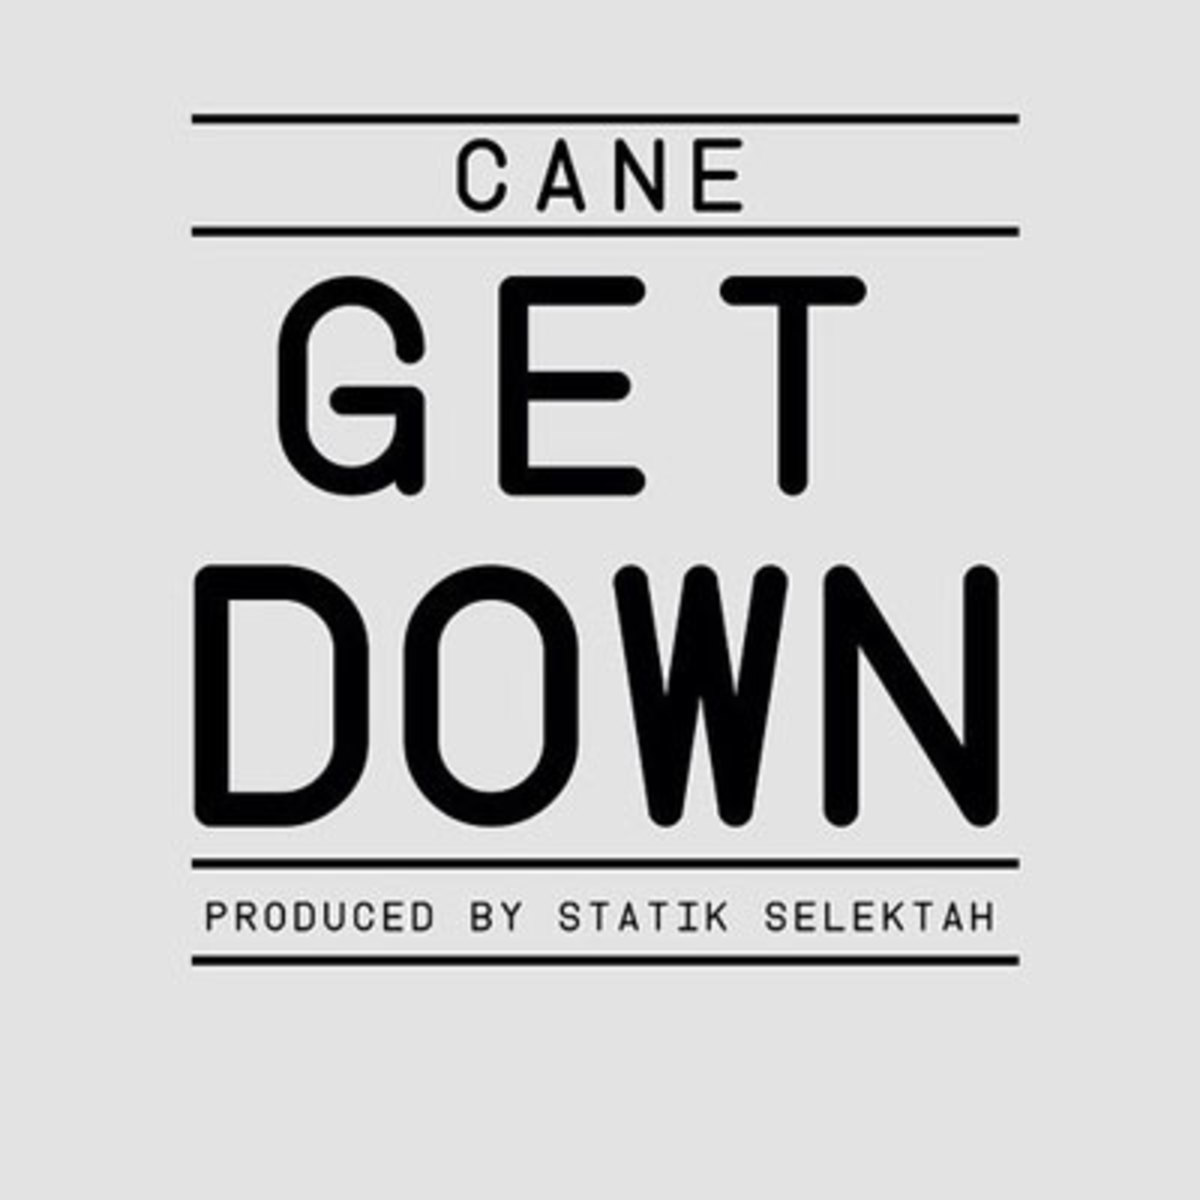 cane-getdown.jpg